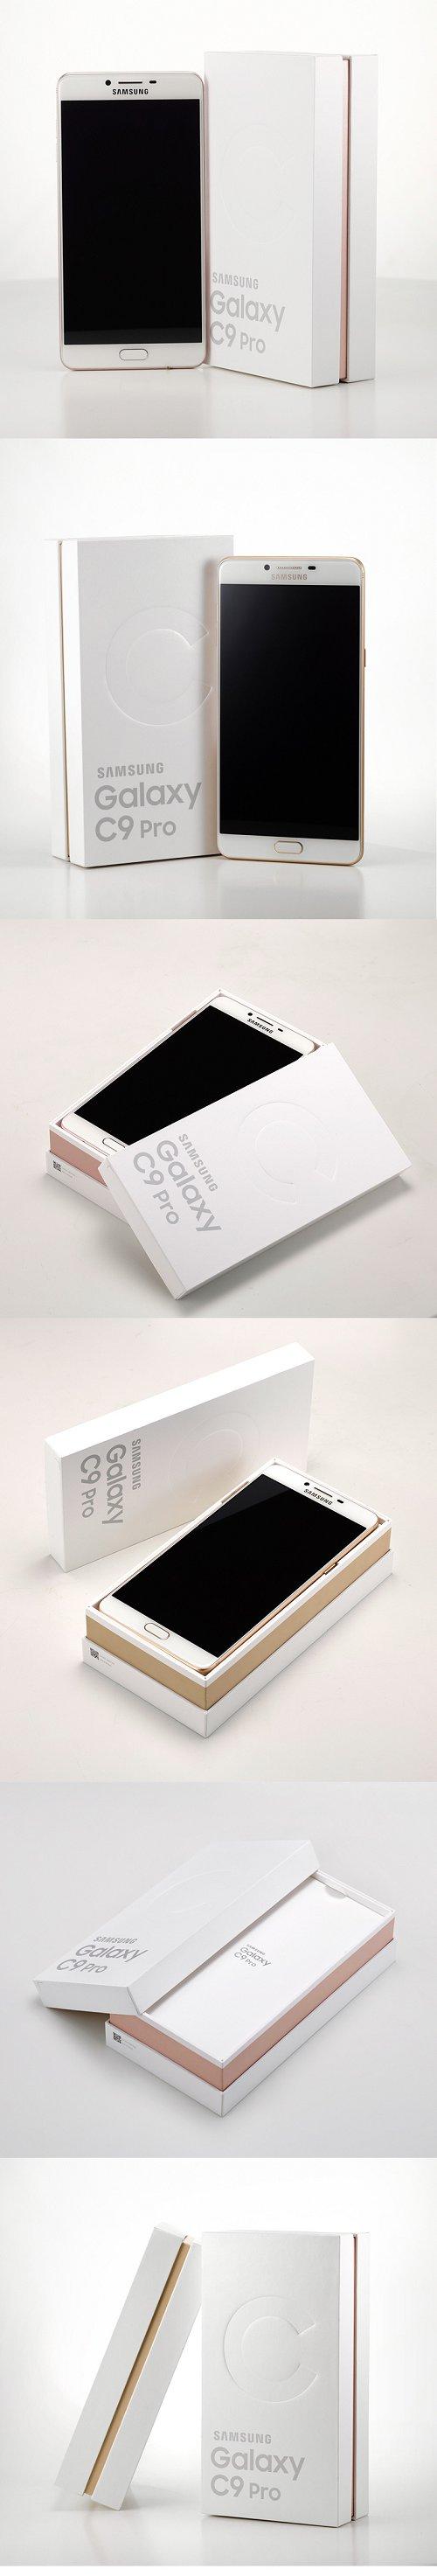 Samsung Galaxy C9 Pro_12